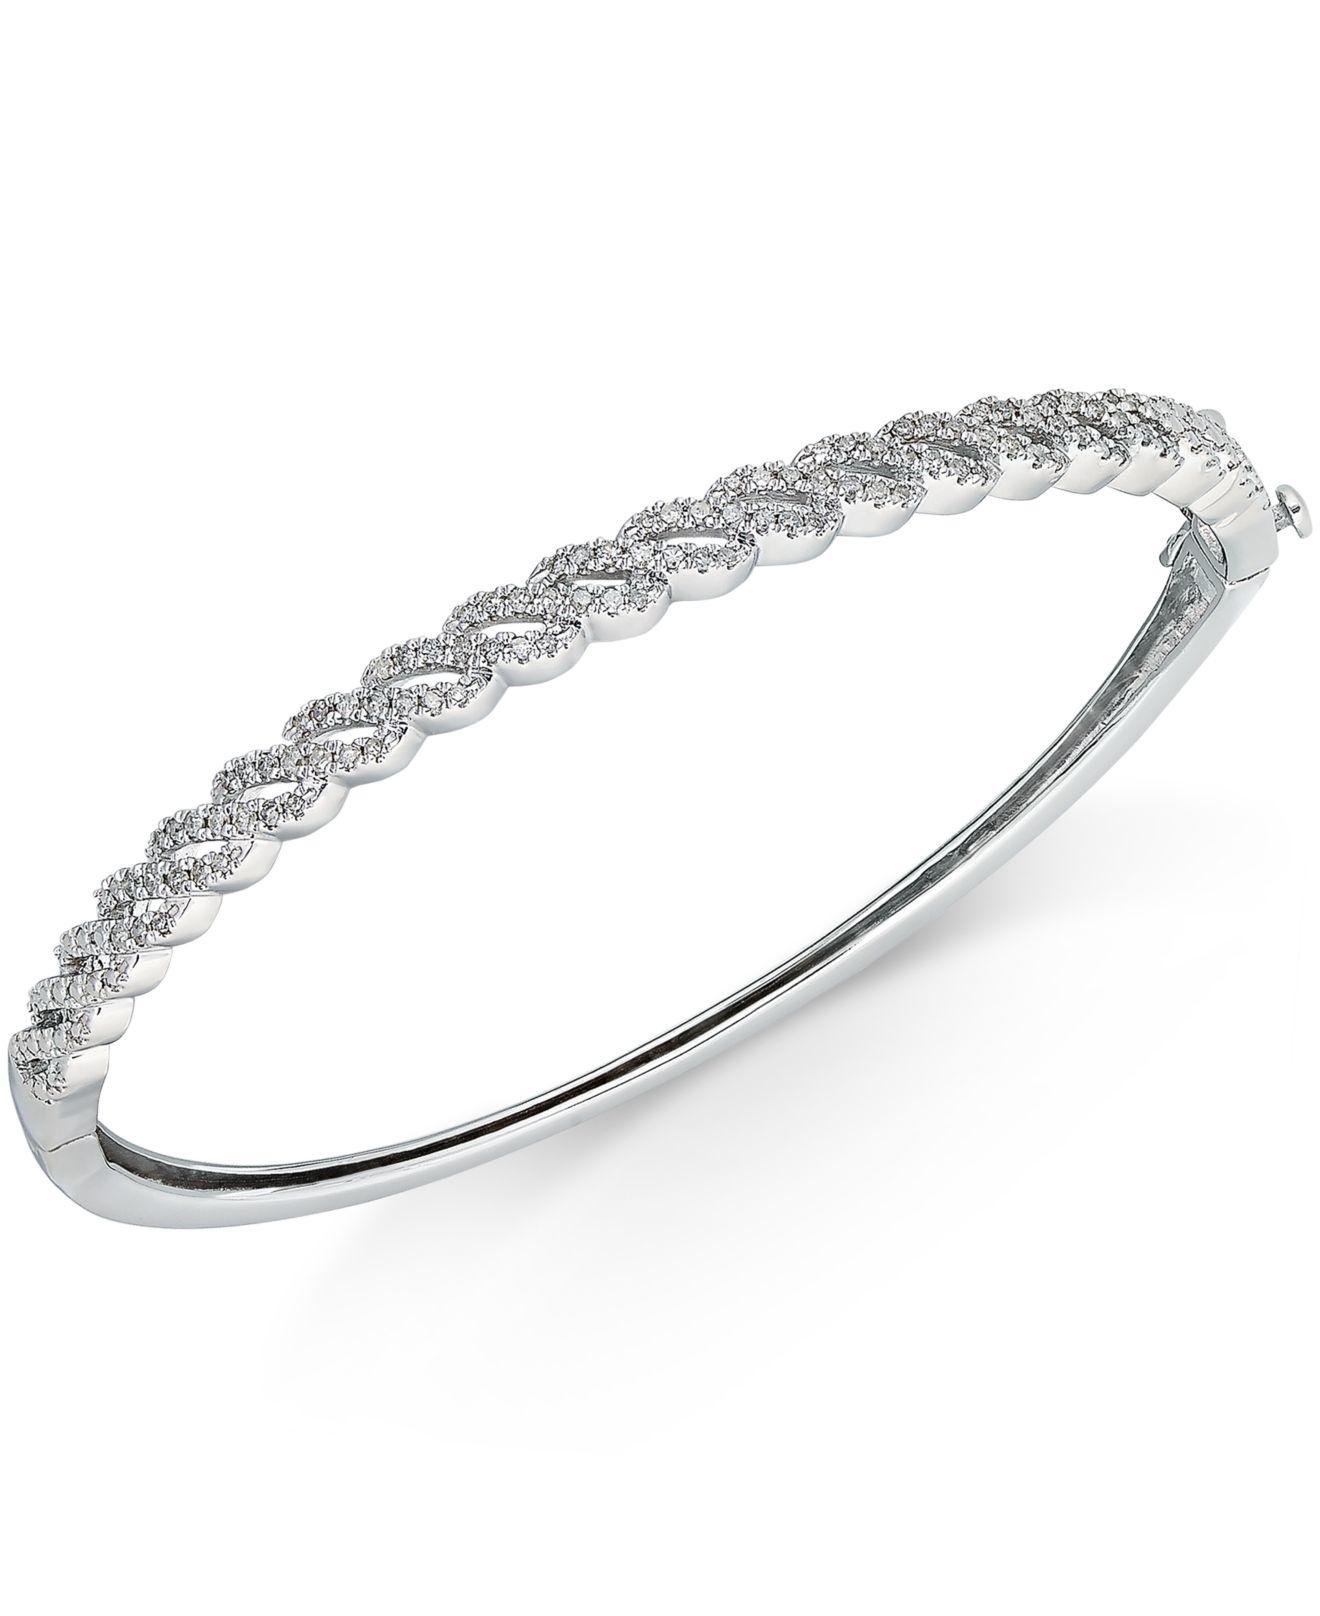 macy s mini loop bangle bracelet 1 2 ct t w in